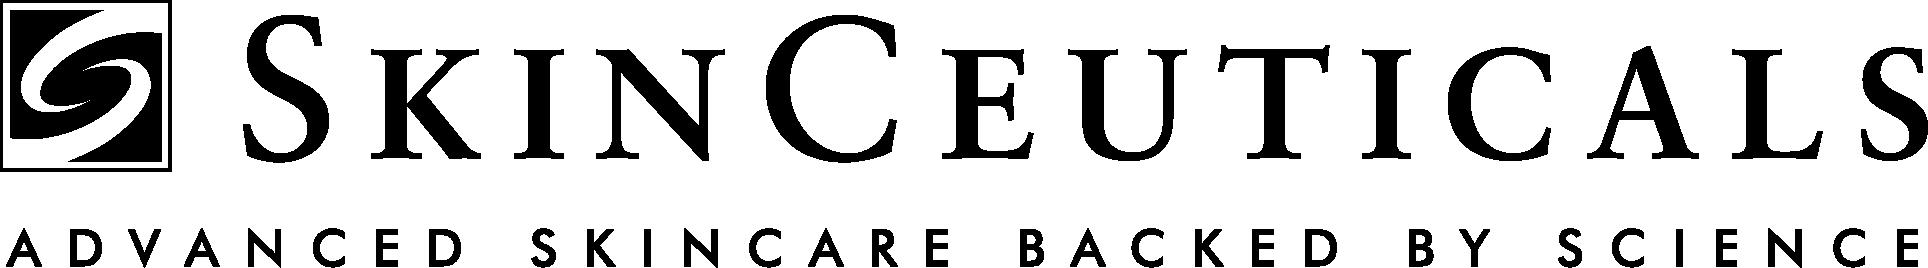 Skin Ceuticals Logo.png